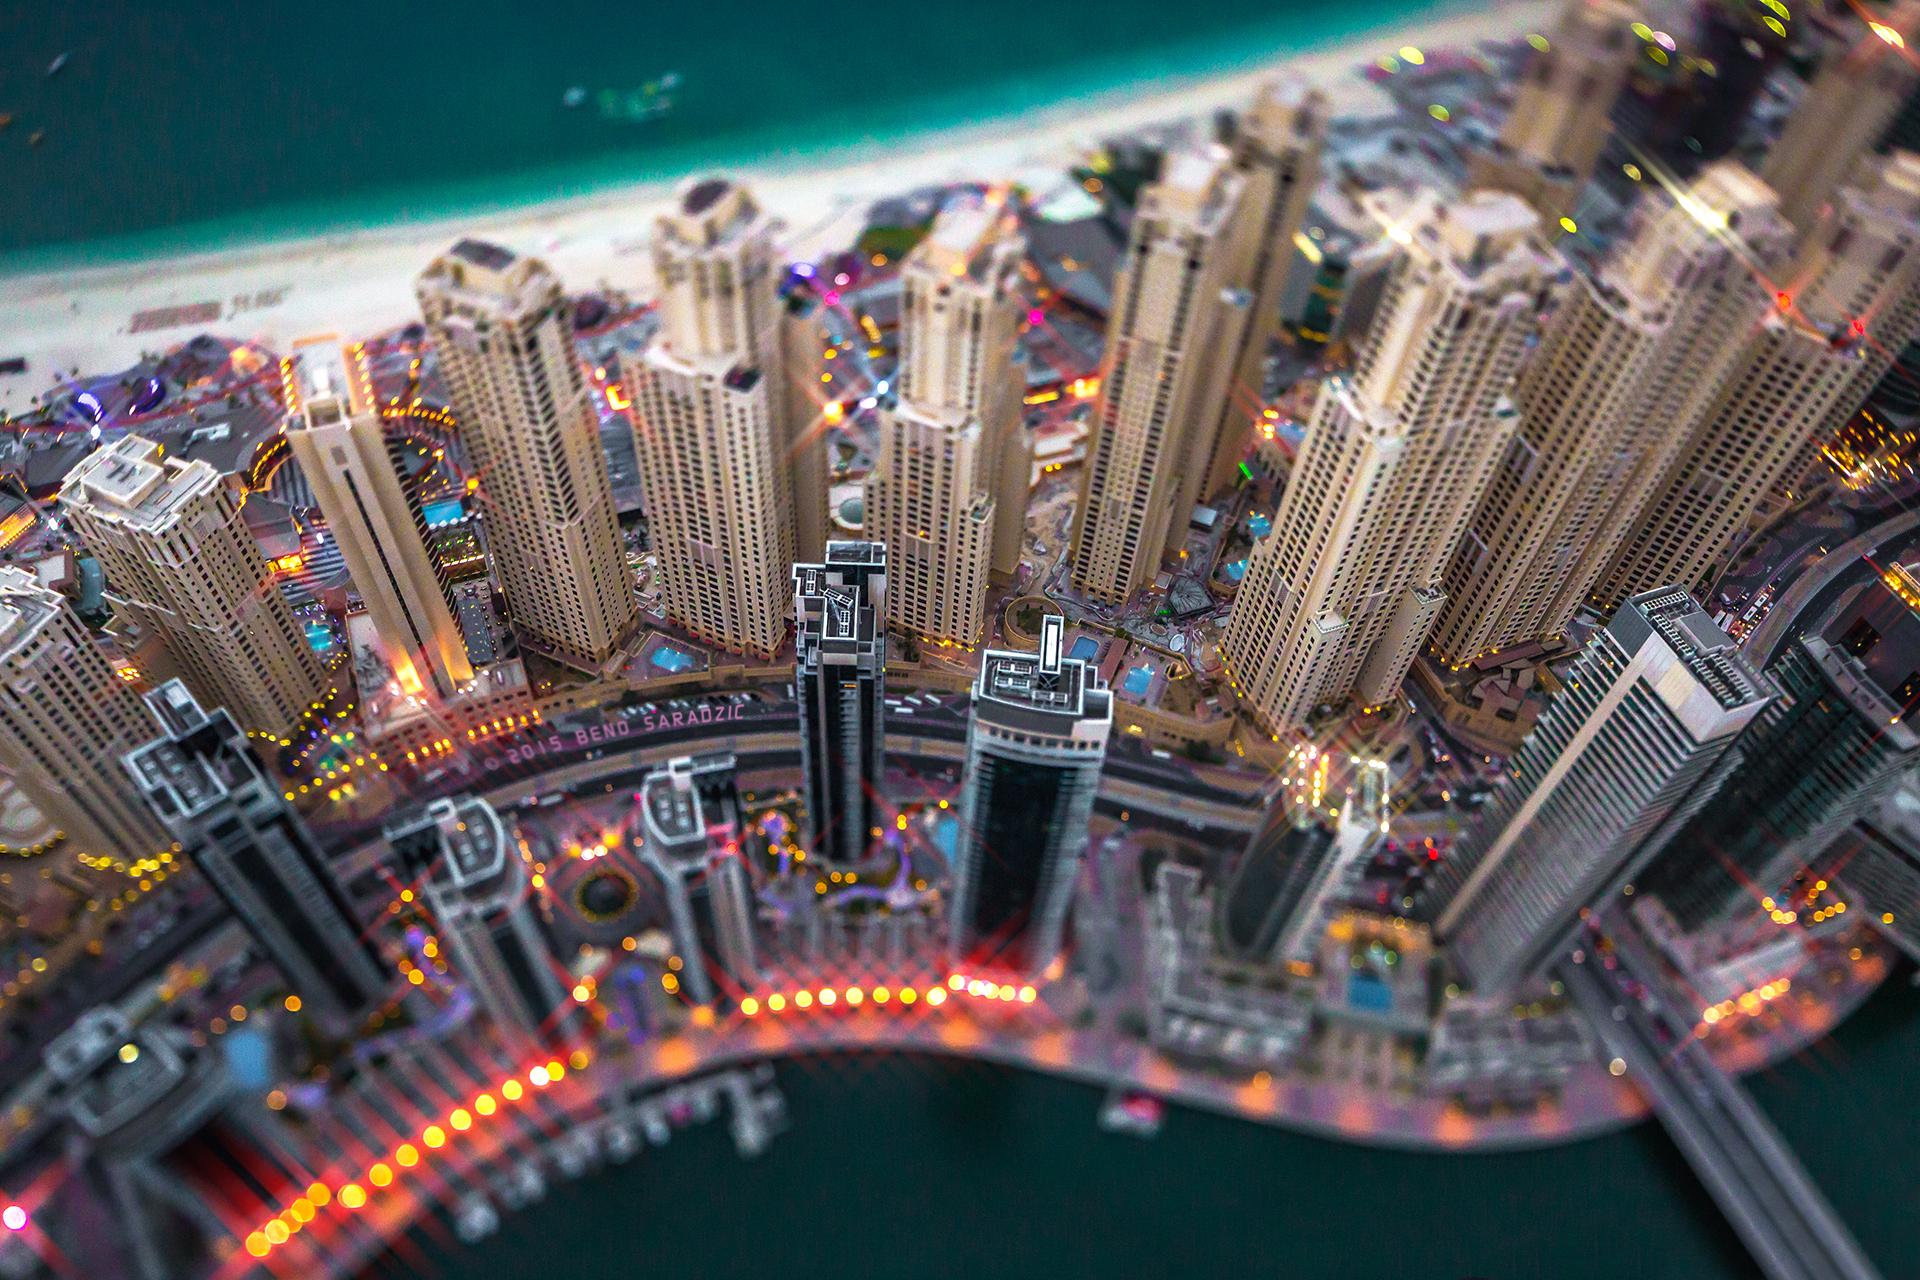 Beach Horizontal Canal Dubai Skyscrapers Rich Uae Arab Luxury Beachfront Unitedarabemirates Aerialphotography Opulent Dubaimarina Wealth Beachfrontproperty